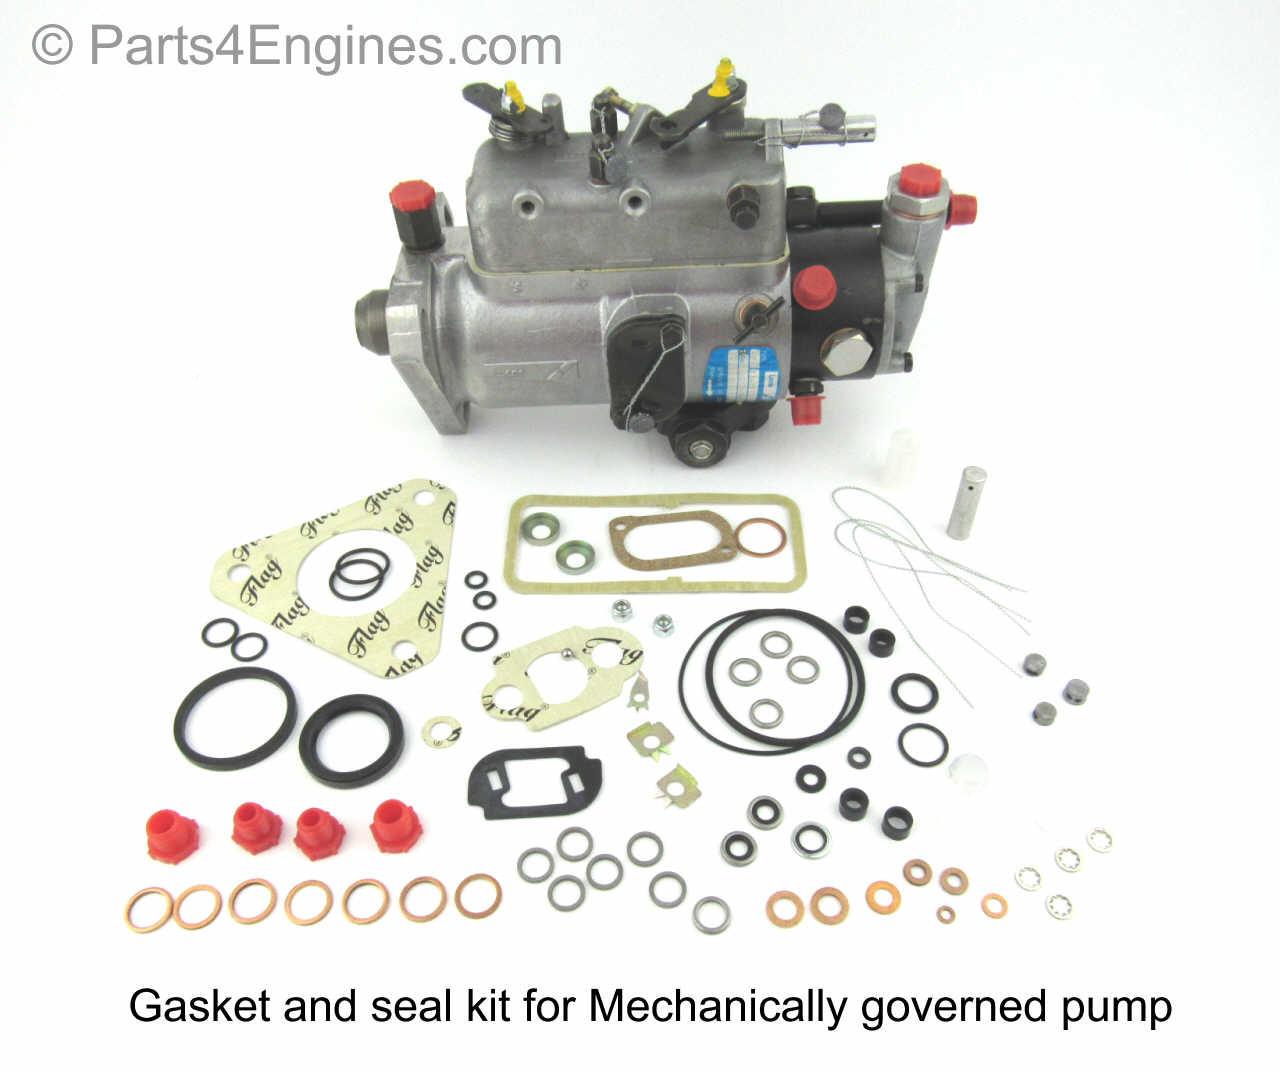 Perkins 4.108 Gasket & Seal Kit for Injector PumpsParts4Engines